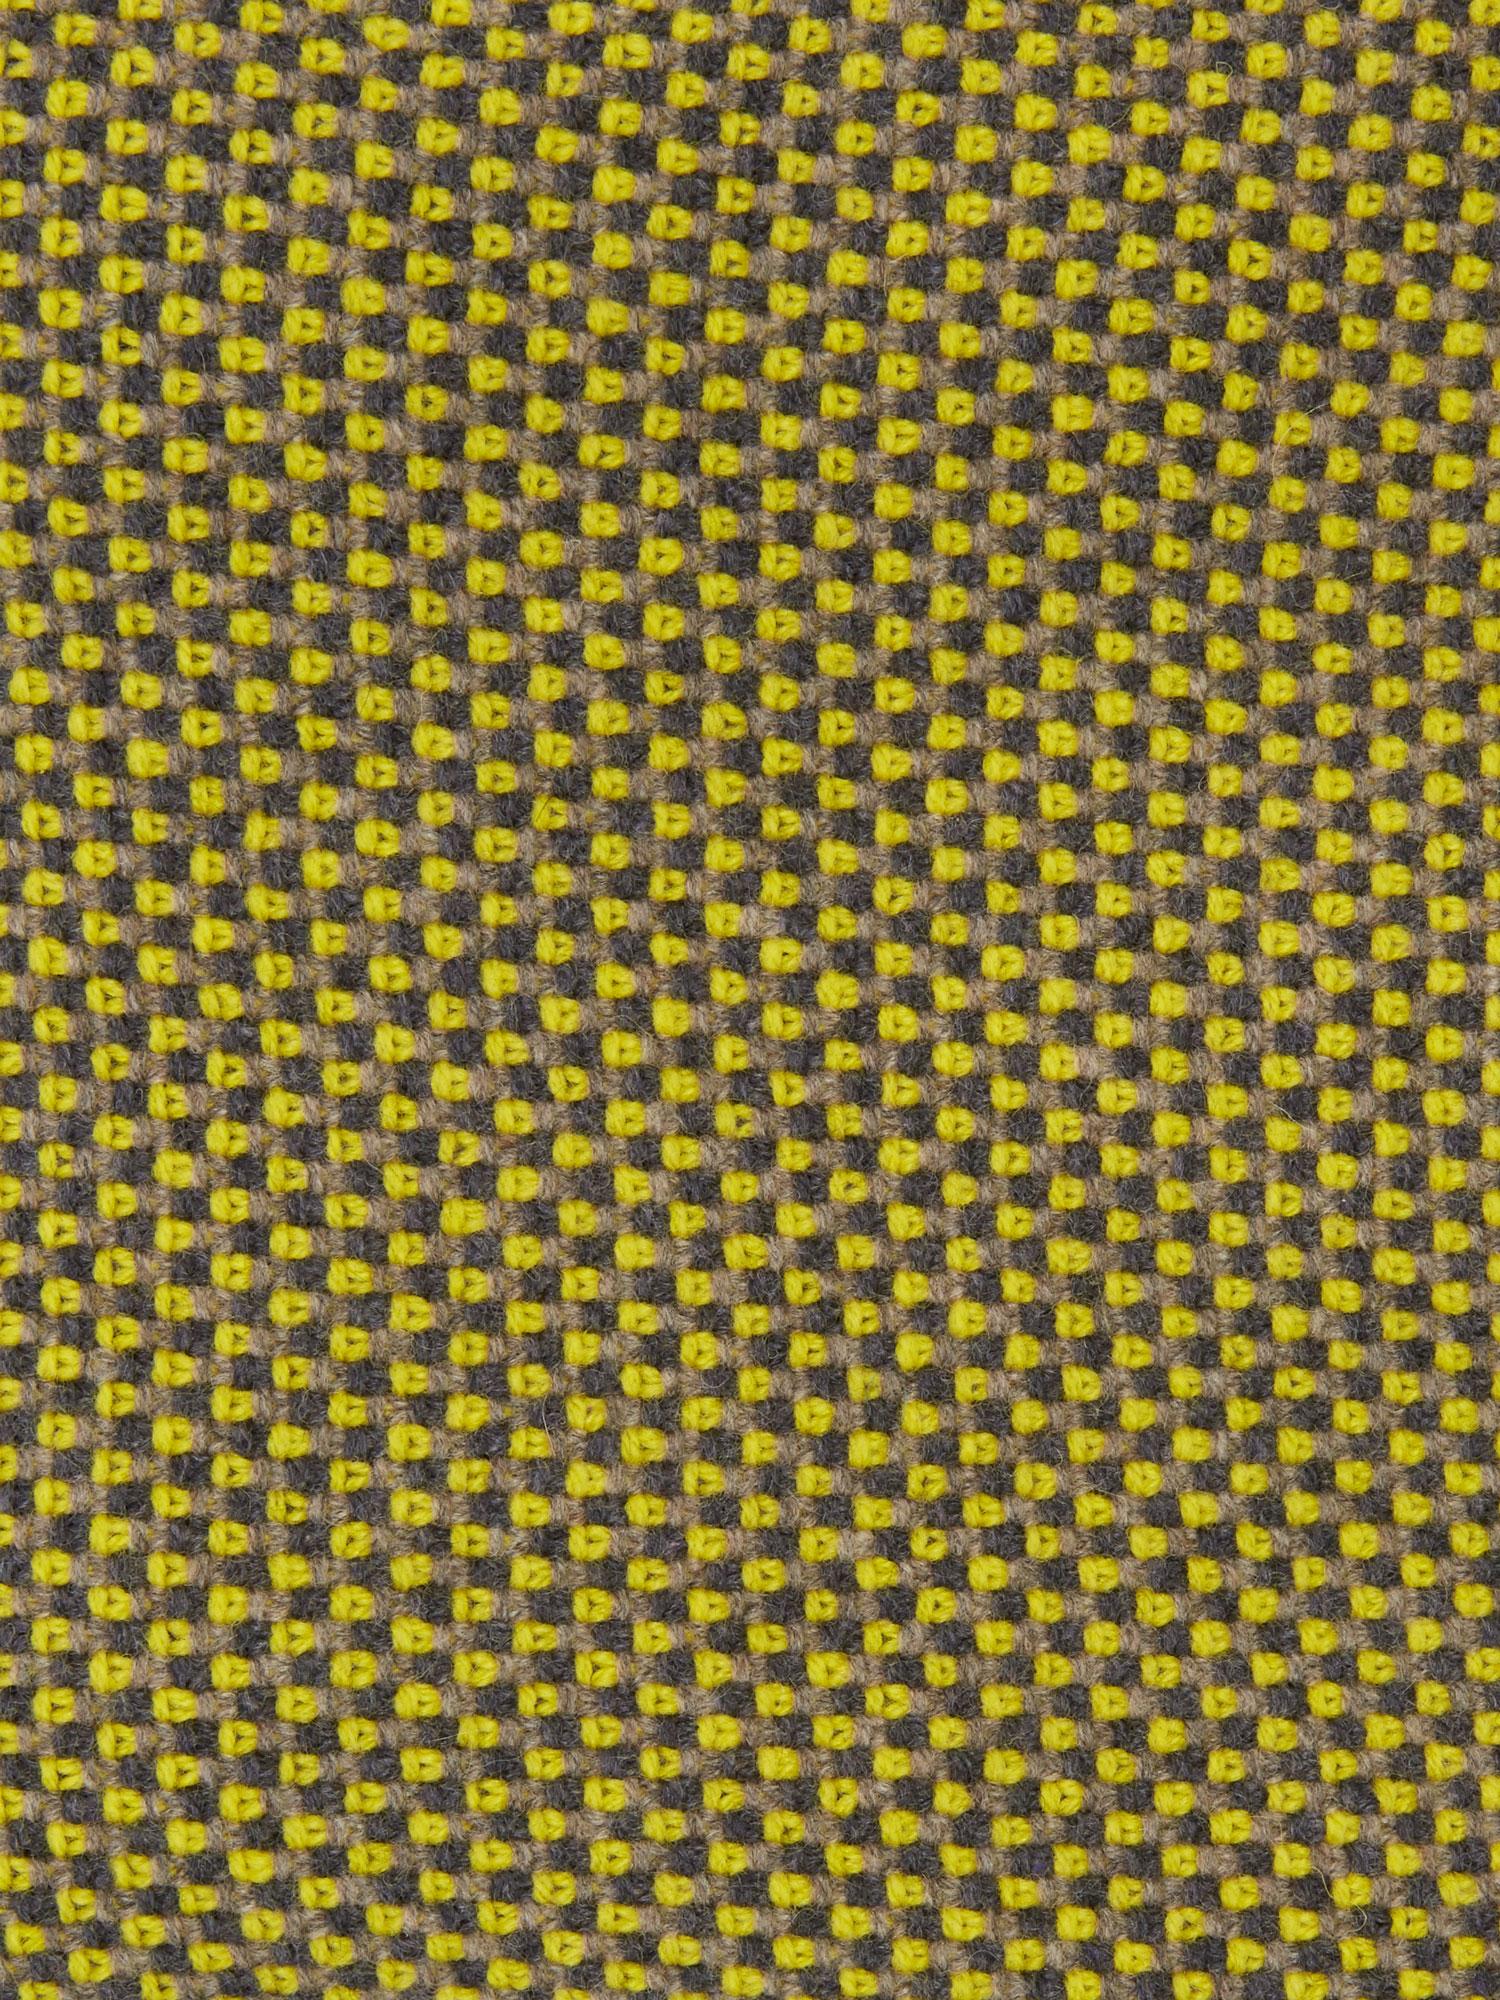 Sweater_L18-10_Birr Birdseye Sweater_2 Variations_Mustard_SWATCH_PRO SHOT_WEB RES.jpg